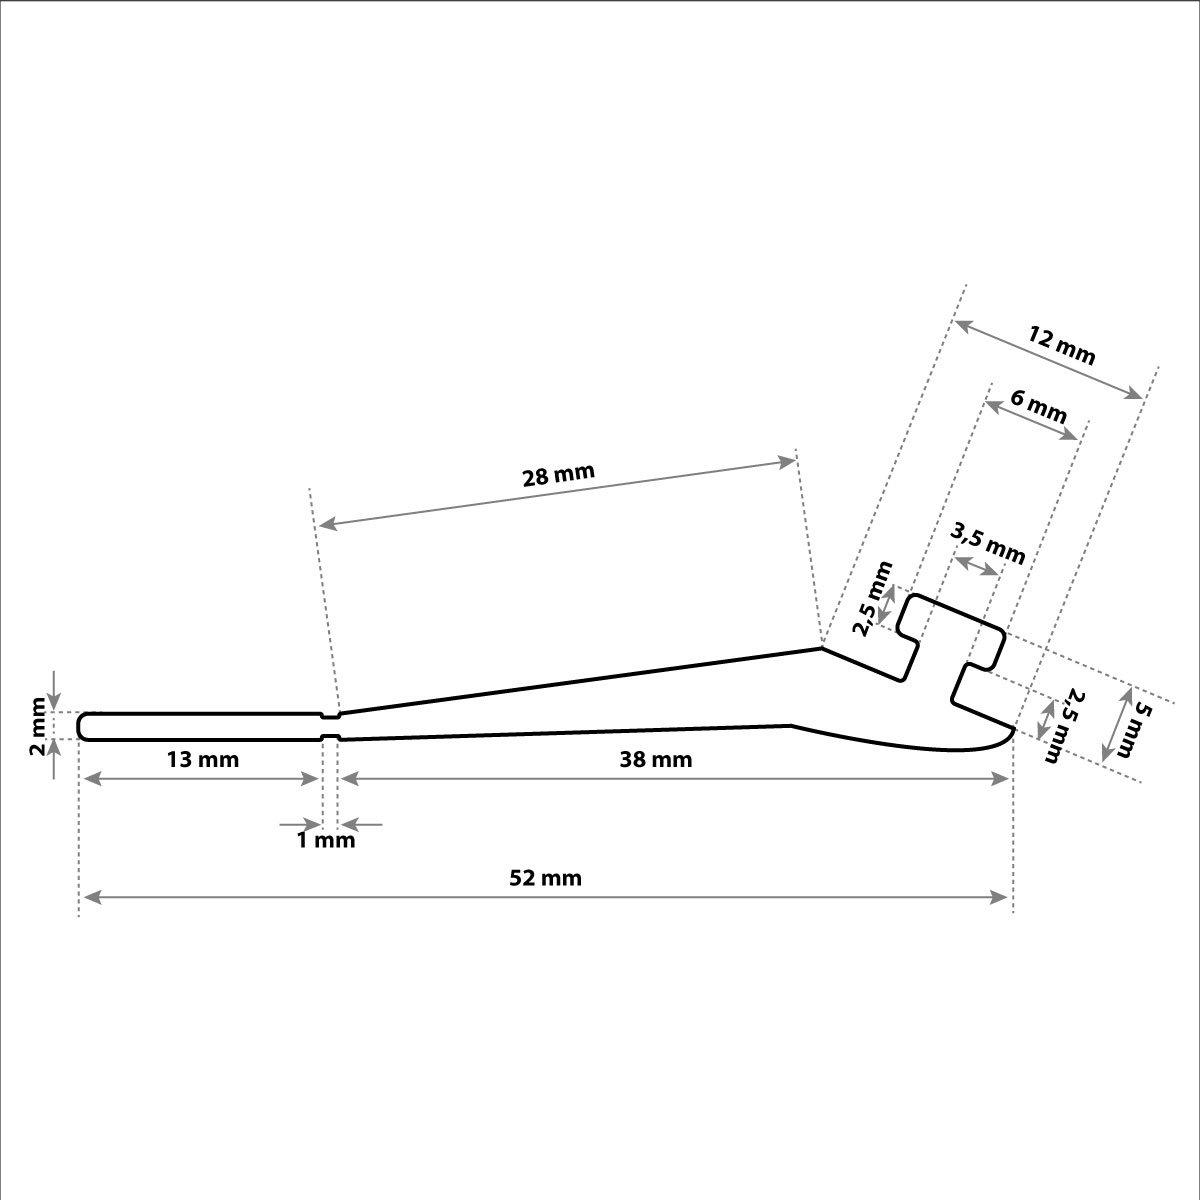 4 m 52x2 mm STEIGNER Guarnizione per Garage SBD03 Nera